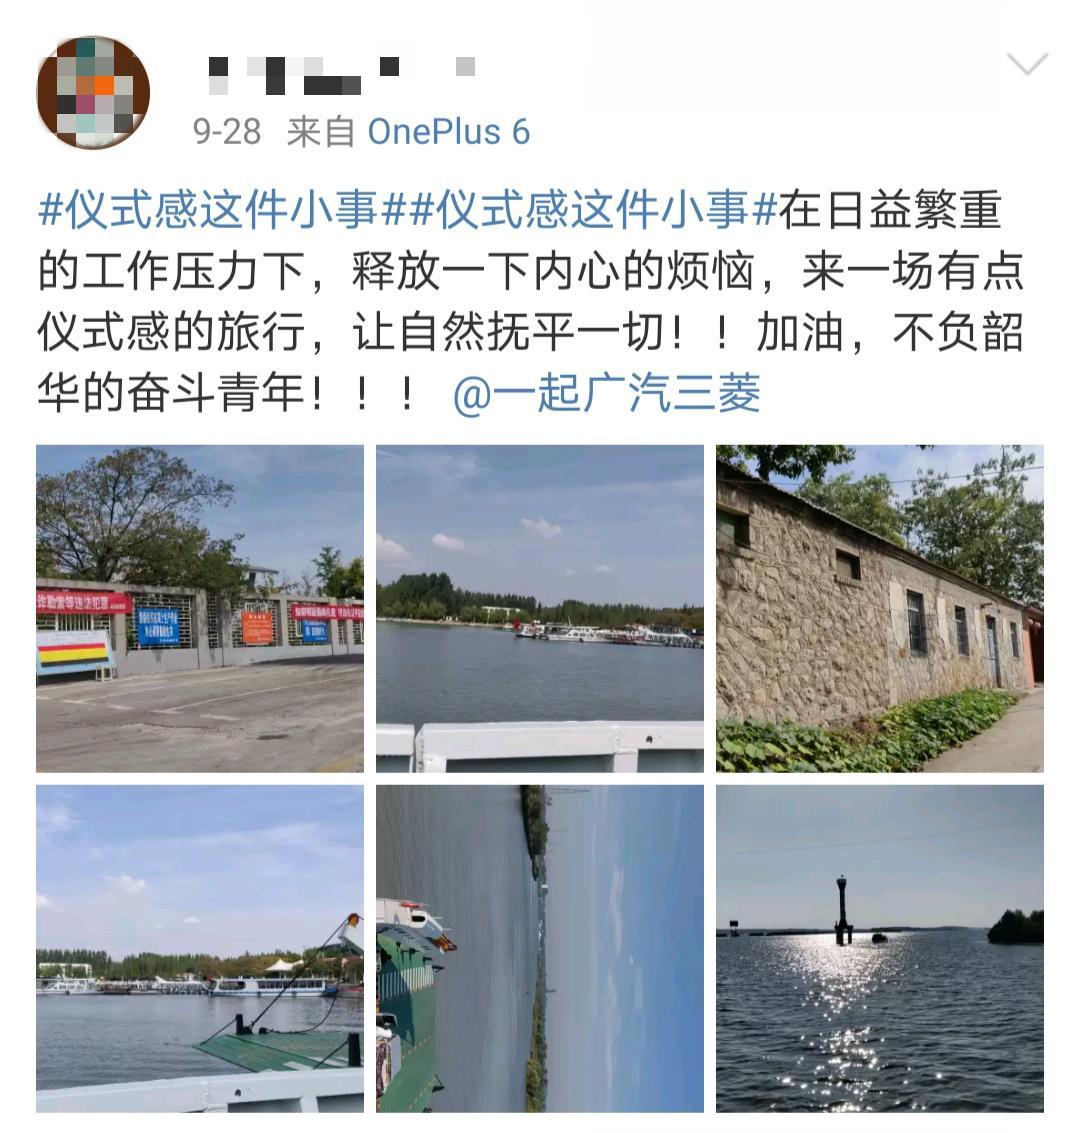 //img5.autotimes.com.cn/news/2020/10/1018_210518528216.jpg